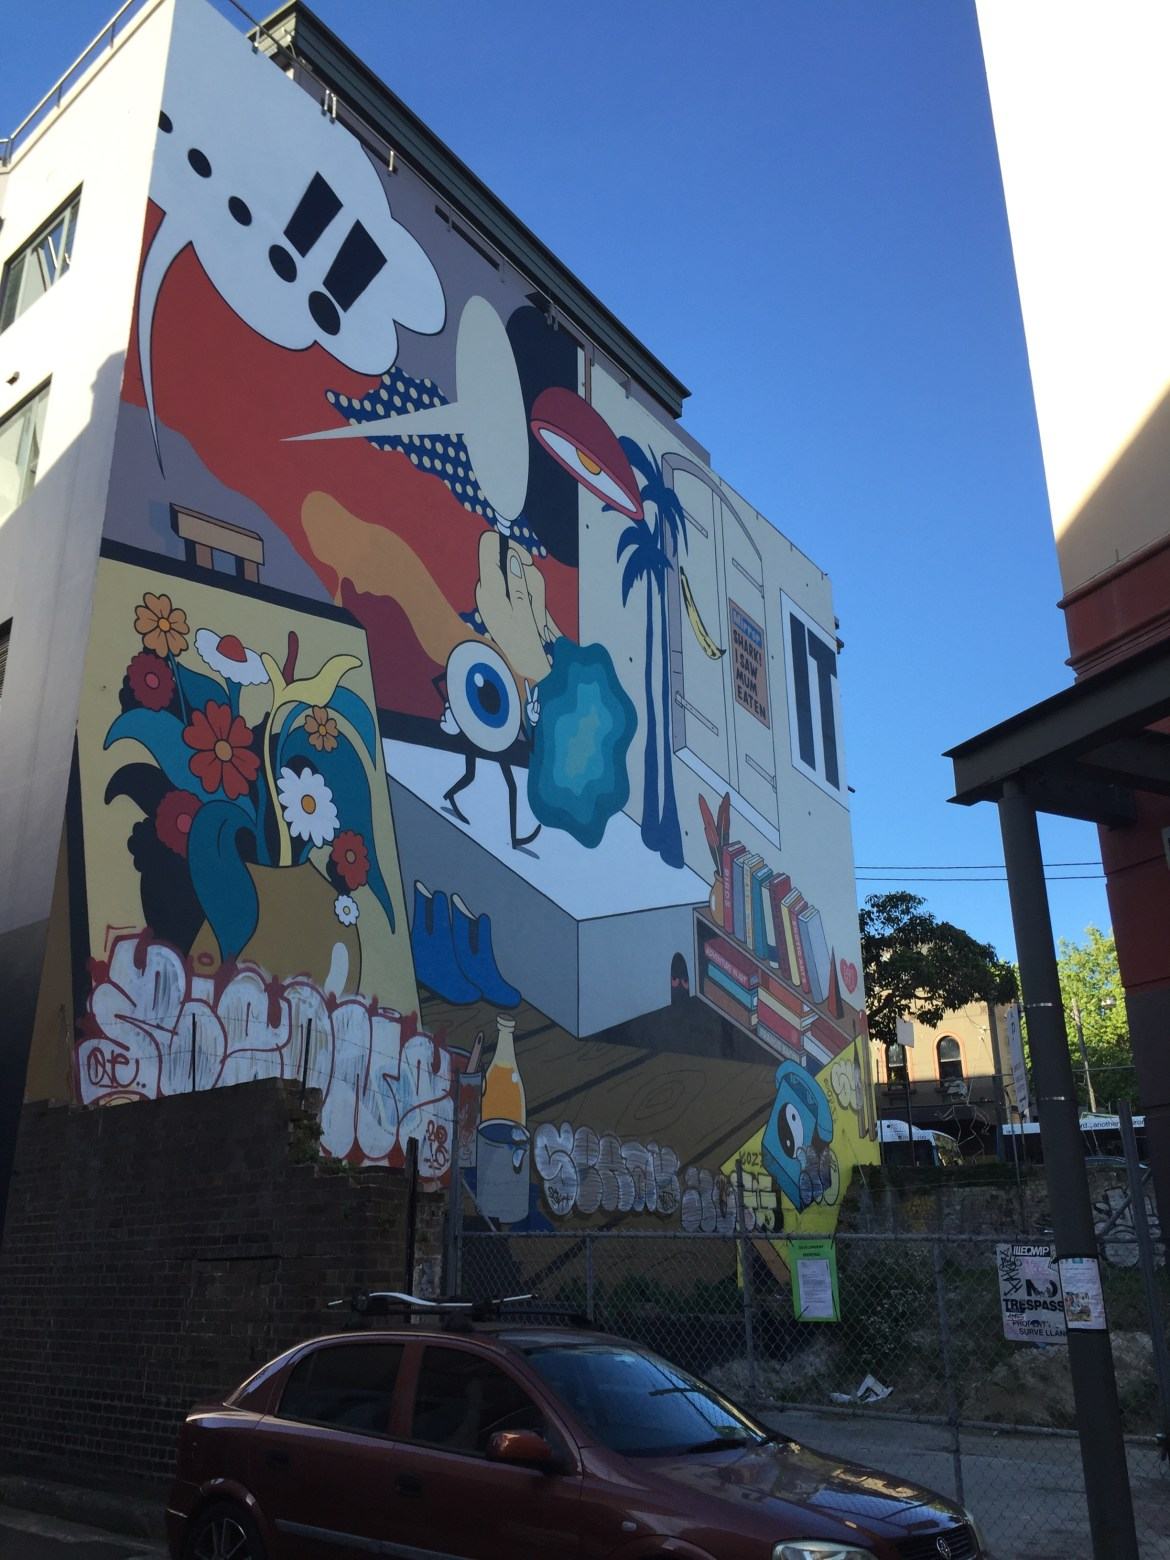 {Photoblog} Sydney Street Art - The Jax Blog